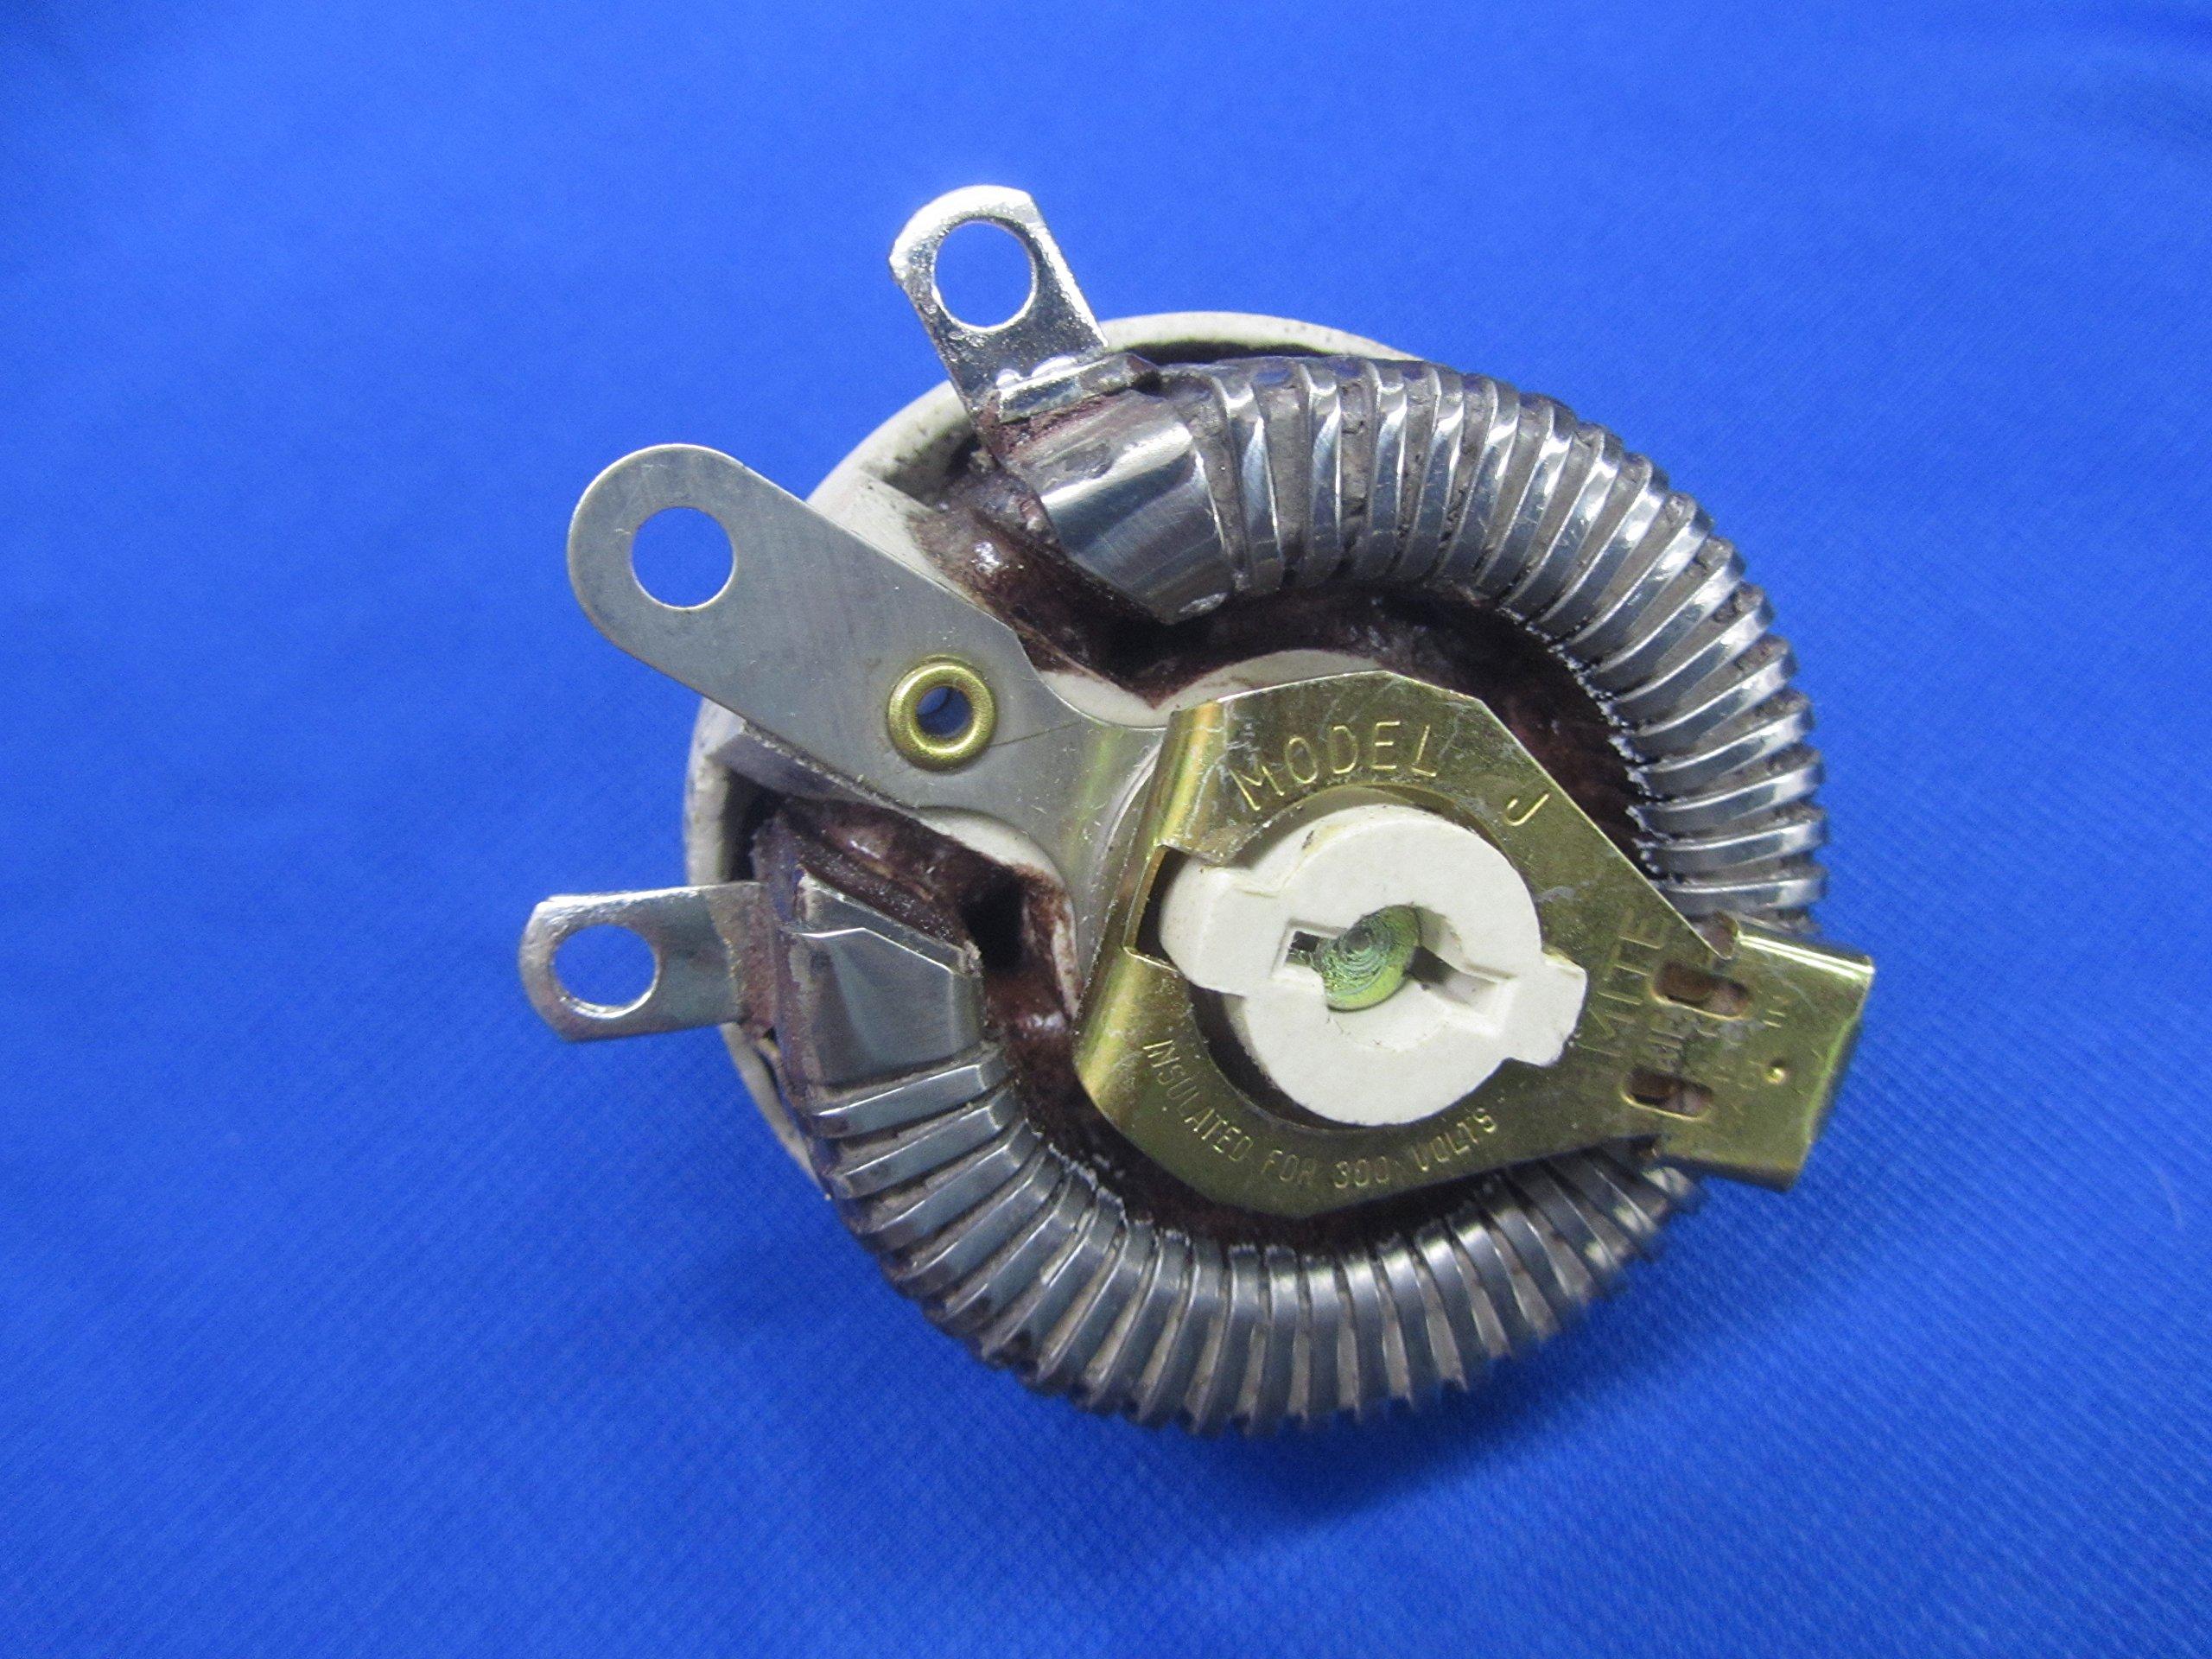 1 Ohm 7.07A 50W Fits Lincoln Welder Rheostat 63031 Weldanpower AC225 / DC-210-6